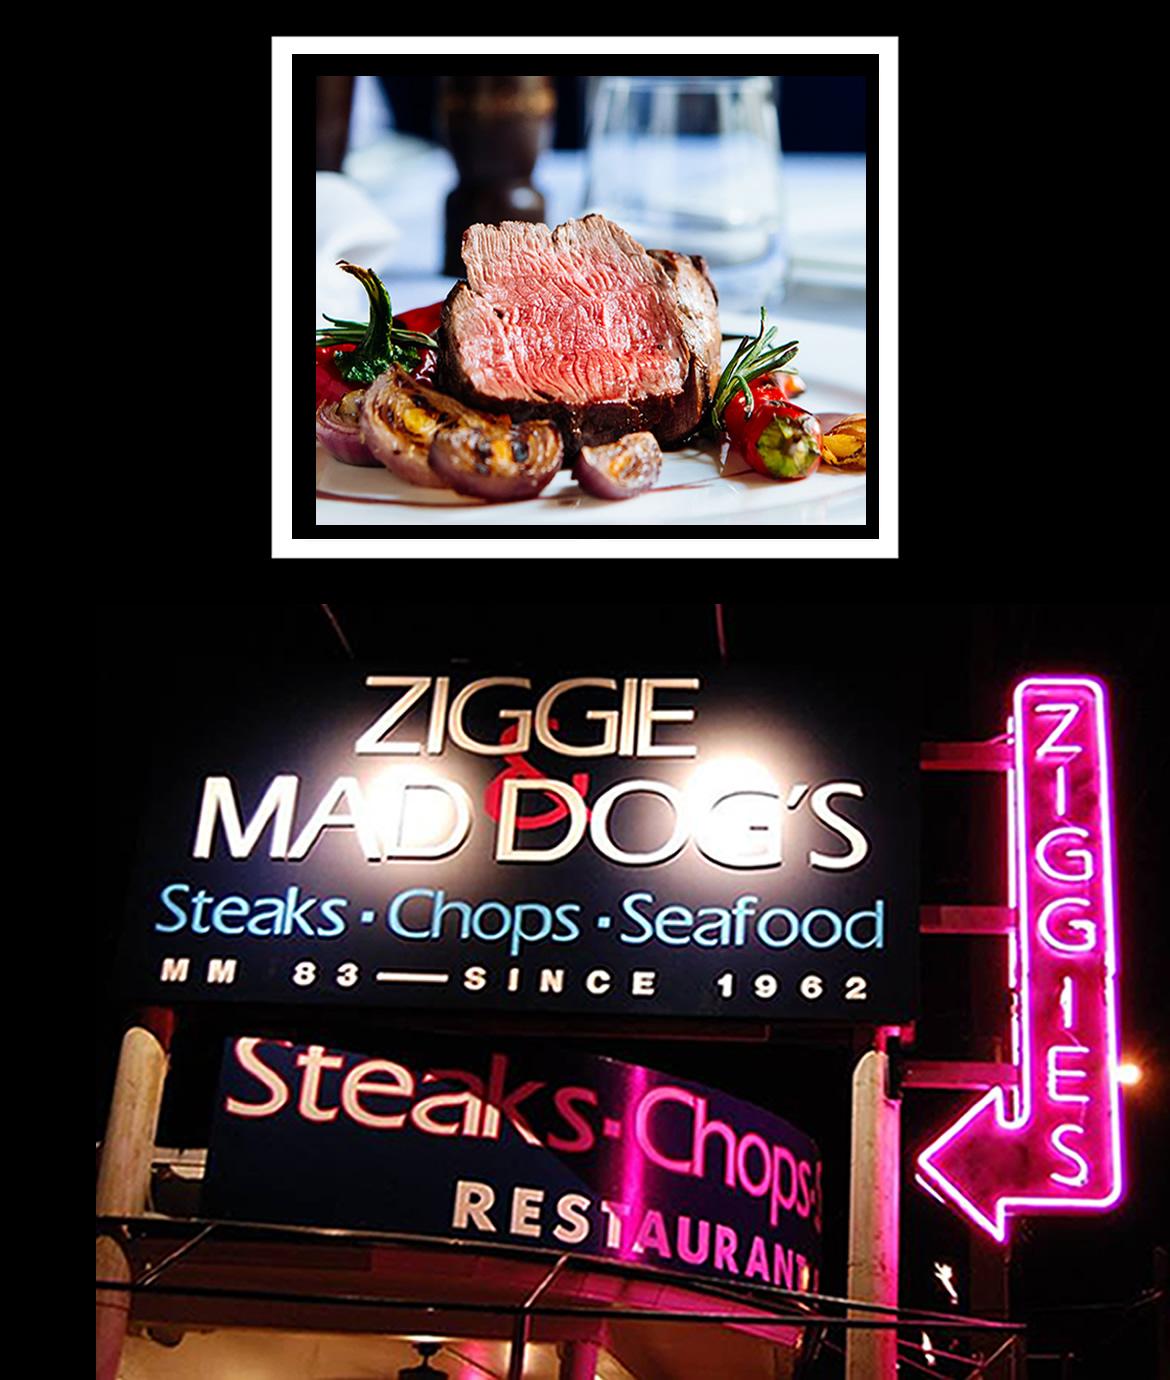 Ziggie & Mad Dog's - 5 Star Steaks In The Florida Keys